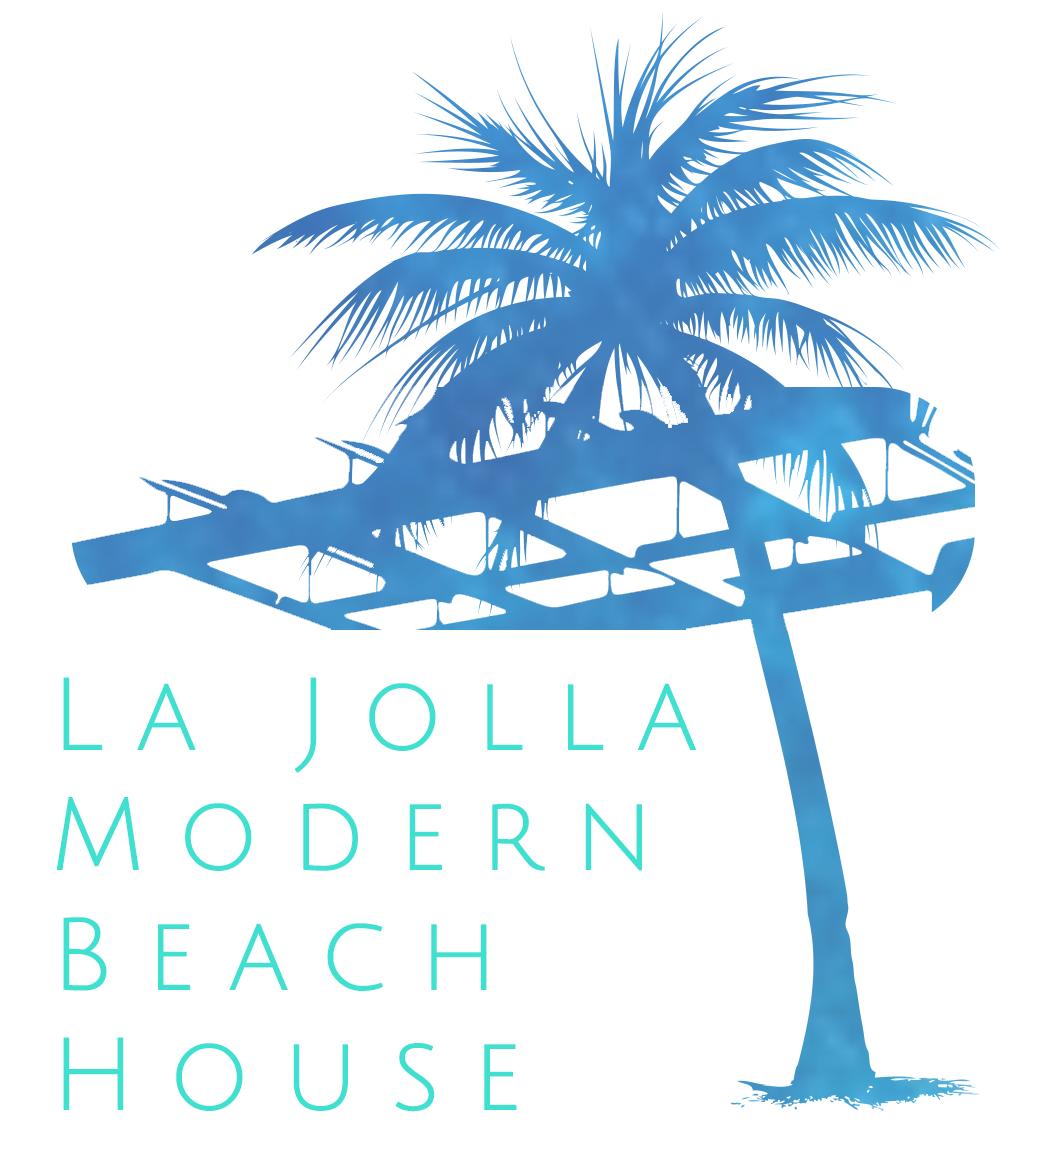 lajollamodernbeachhouse-03312019-a copy.png